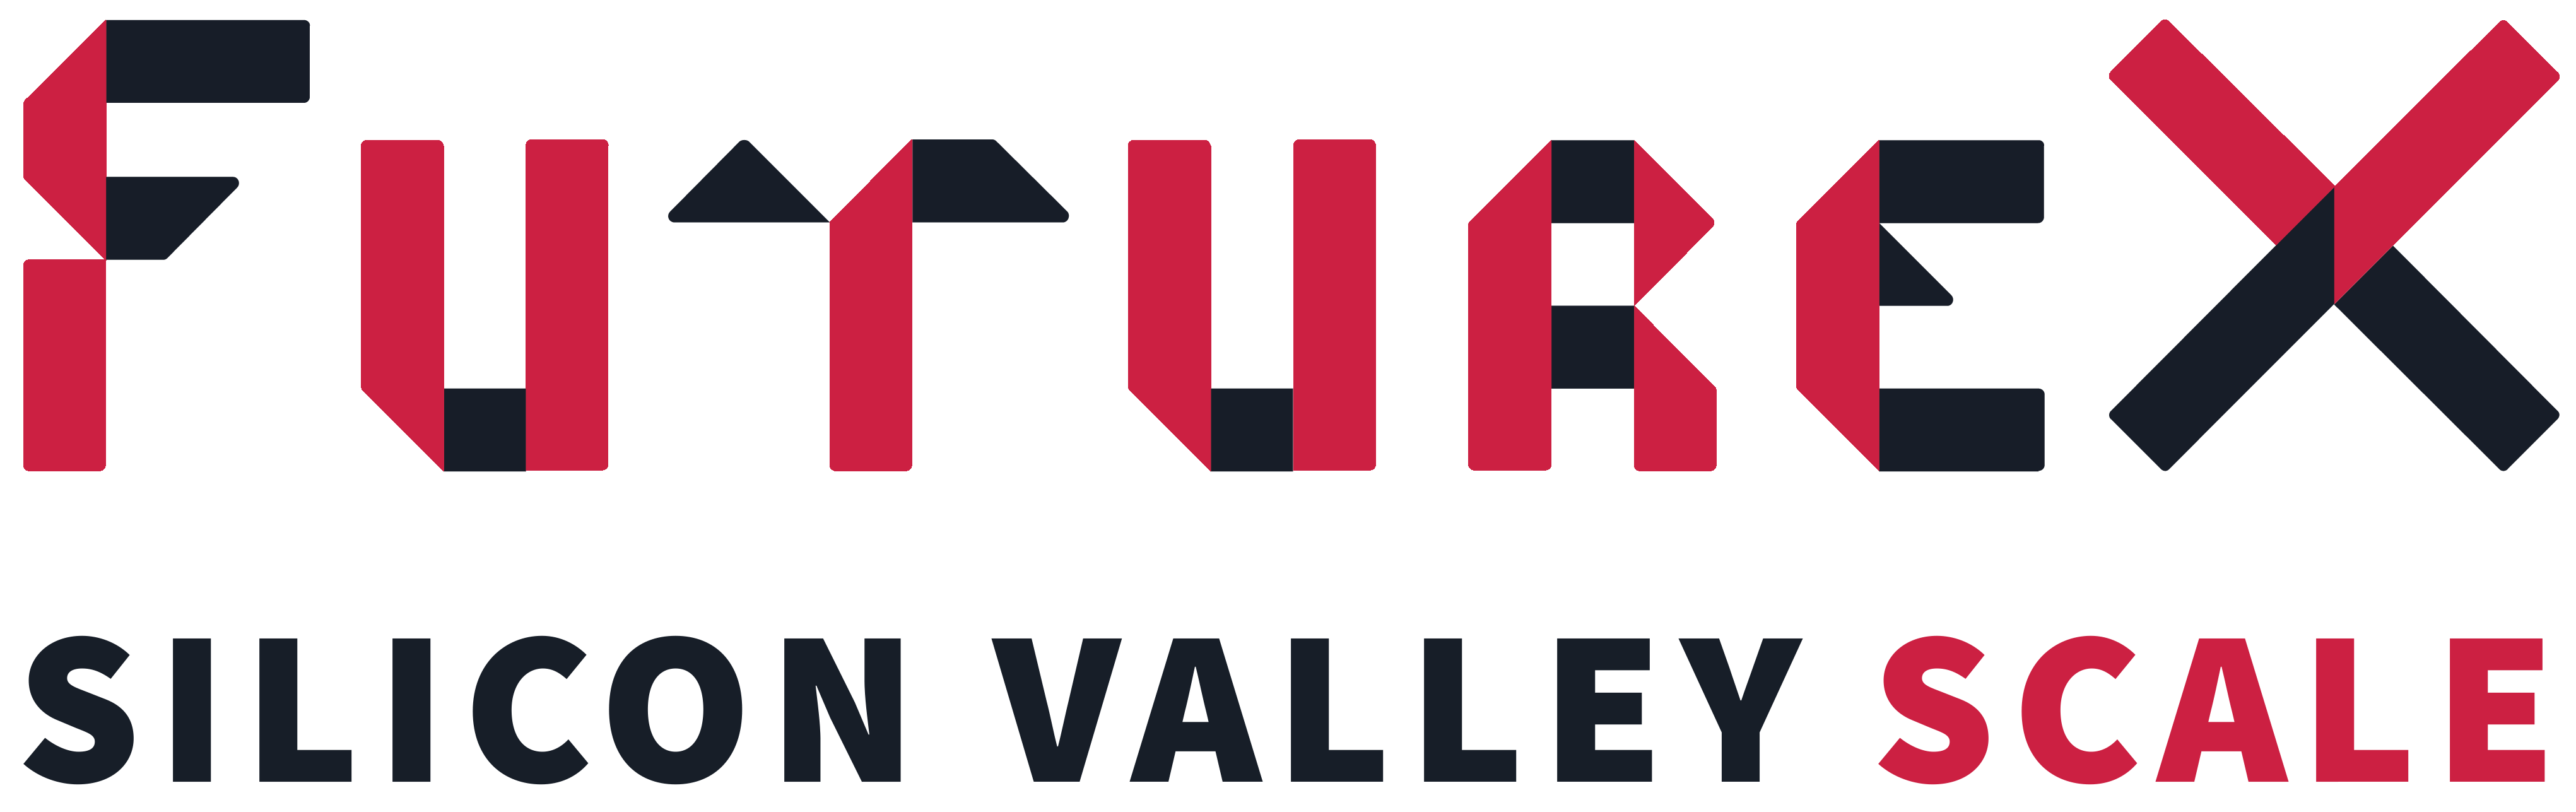 FutureX Silicon Valley Scale logo